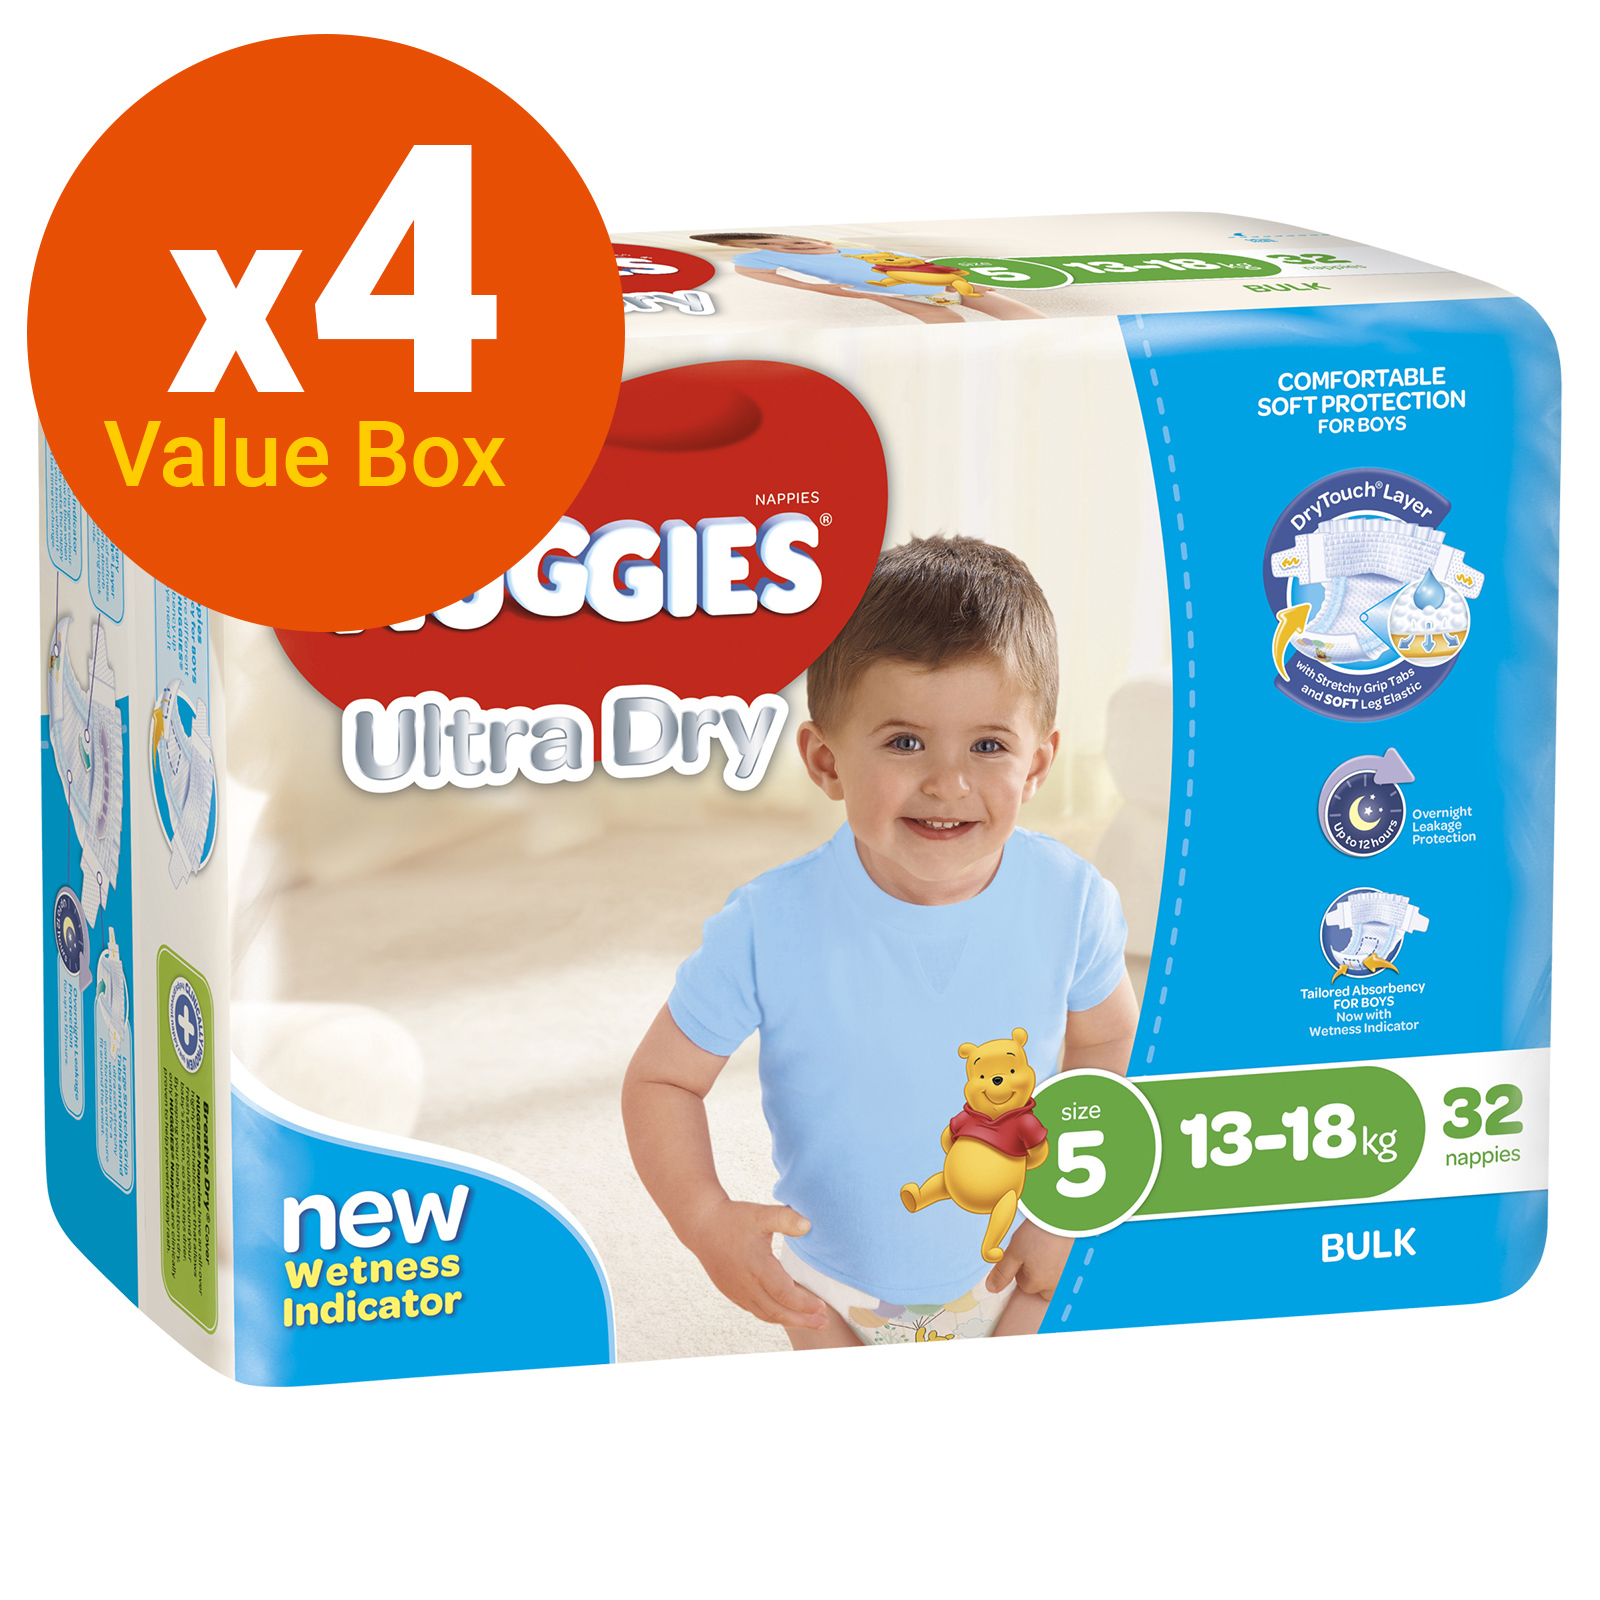 Huggies Ultra Dry Nappies Bulk Value Box - Size 5 Walker Boy (128) image